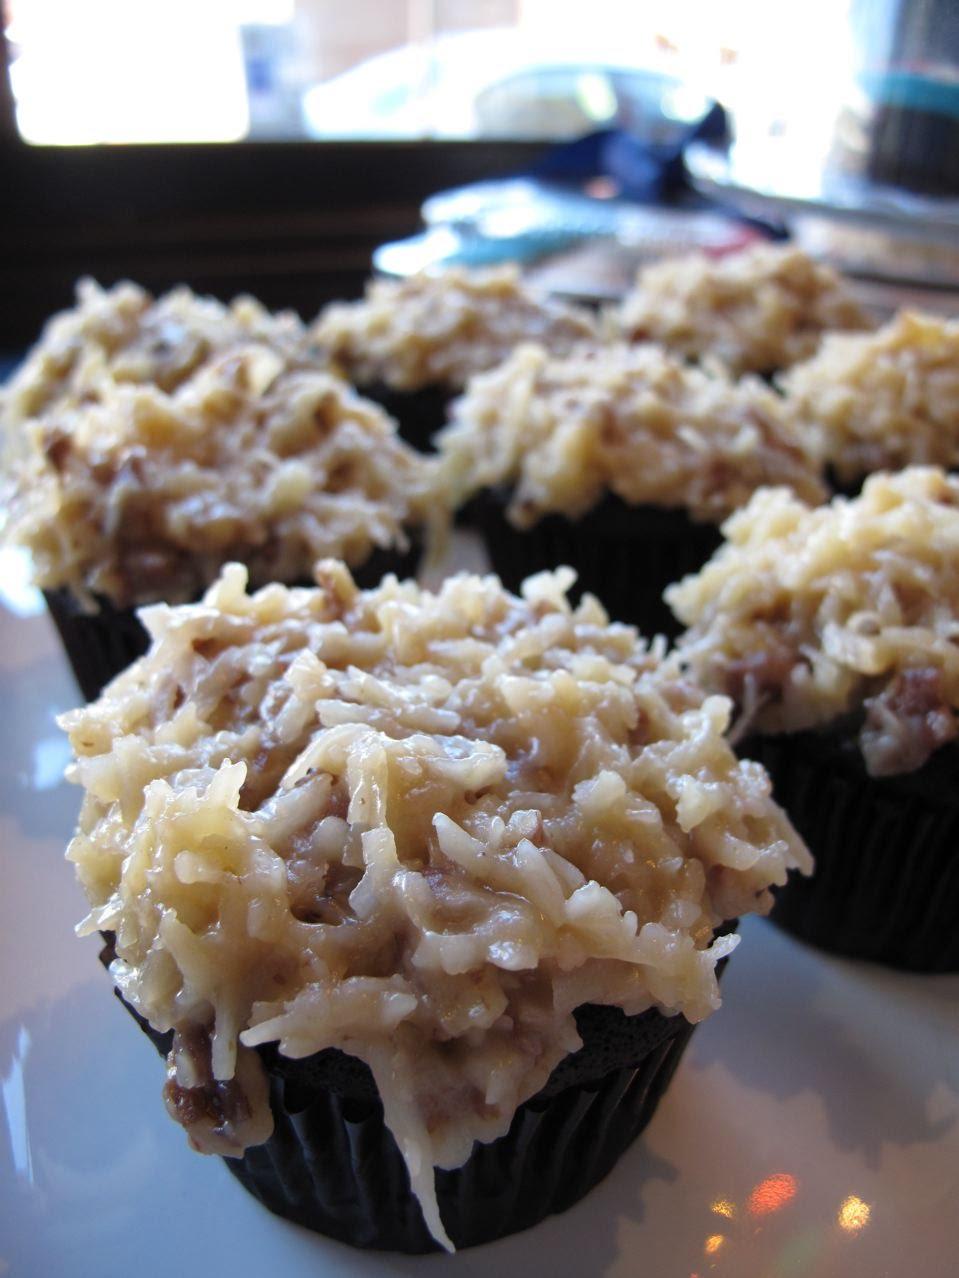 chocolate cupcakes (pictured), icebox cupcakes, boston cream pie